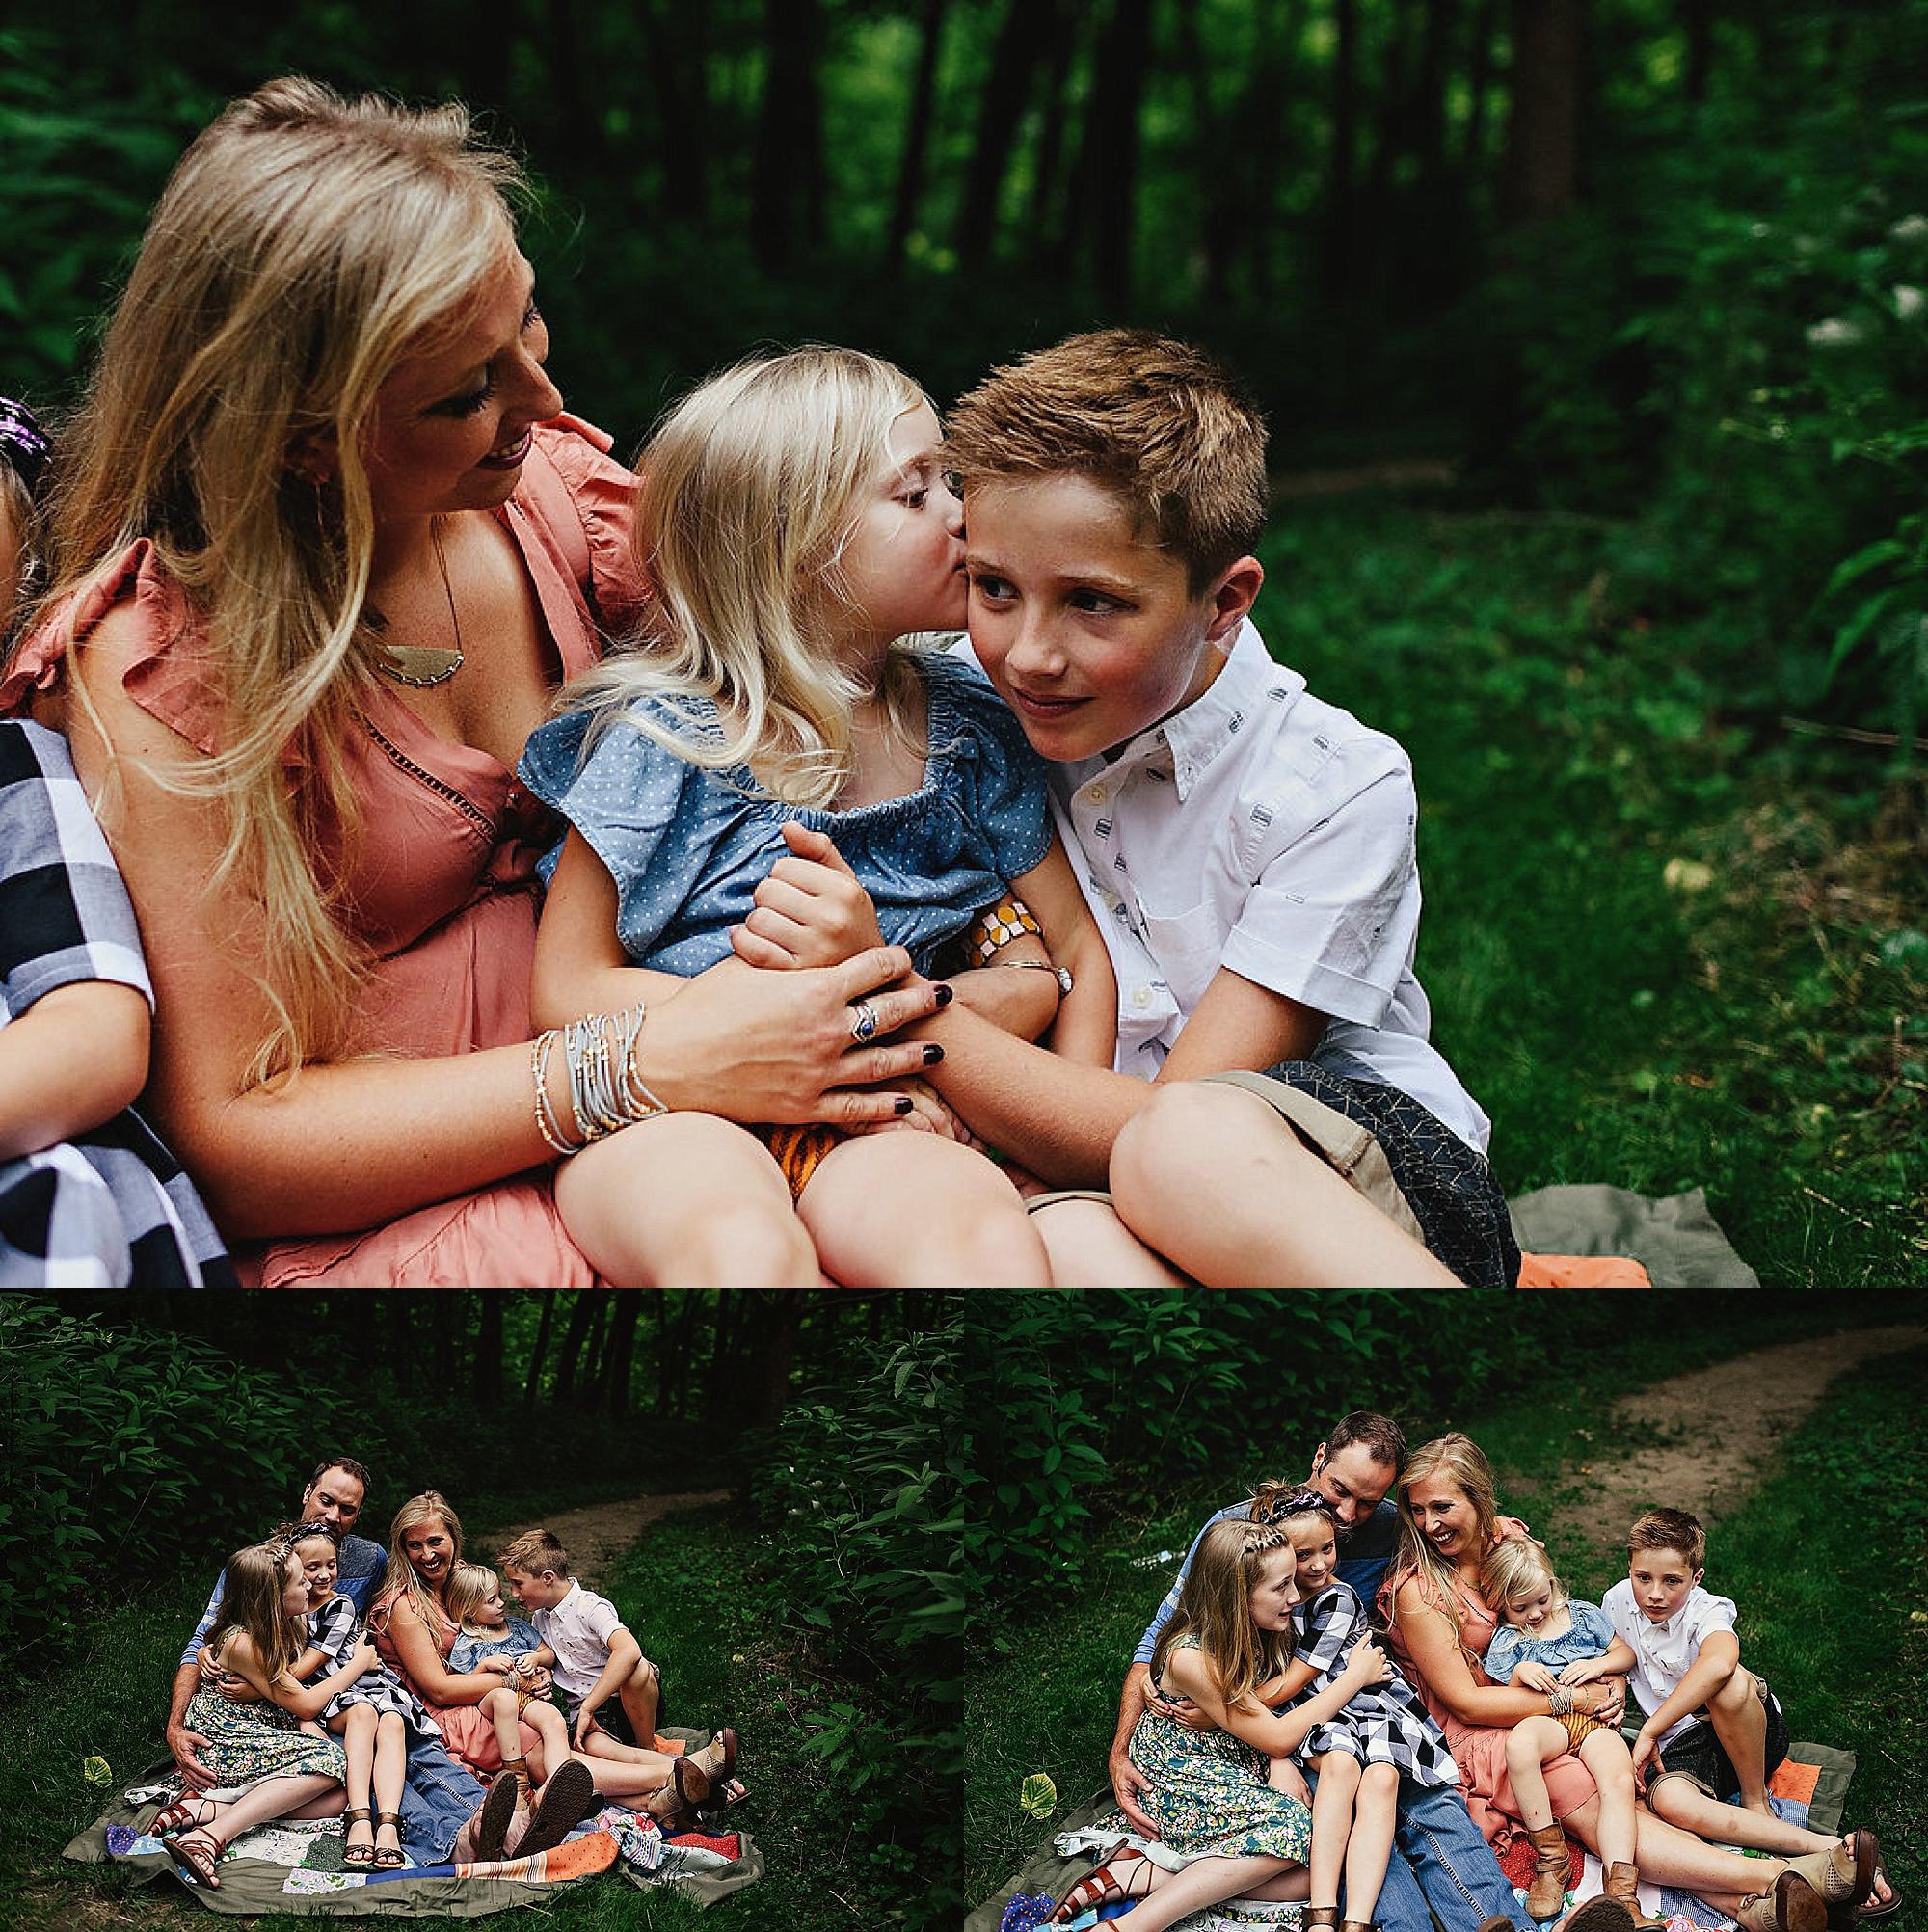 bandy-family-lauren-grayson-akron-ohio_0026.jpg